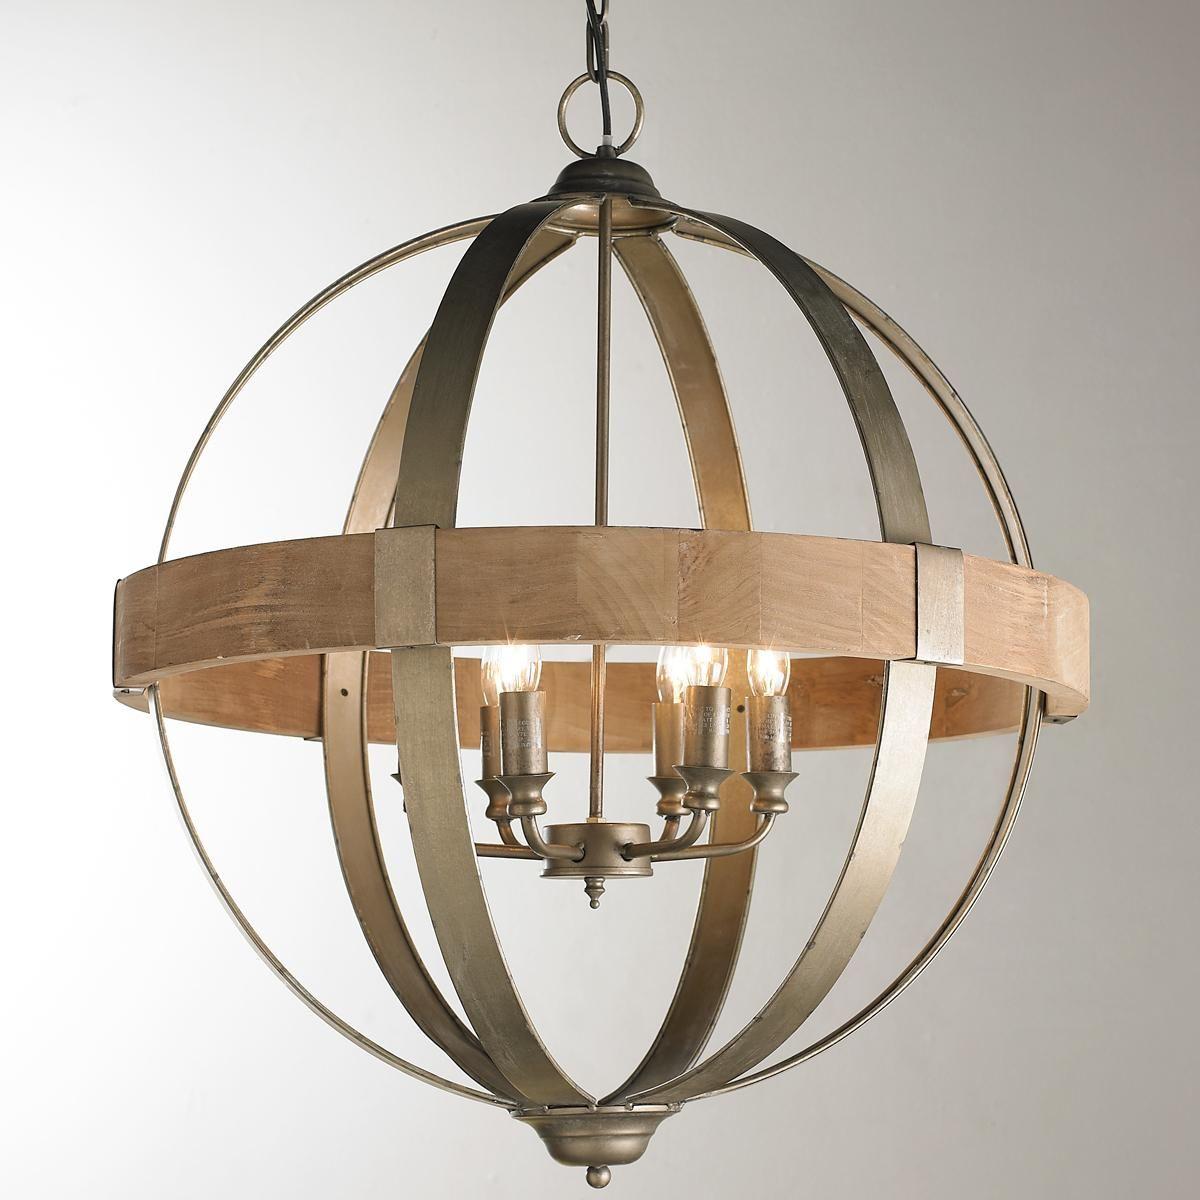 Metal And Wood Globe Chandelier – 6 Light | Feel Like A Kid Pertaining To Ricciardo 4 Light Globe Chandeliers (View 22 of 30)